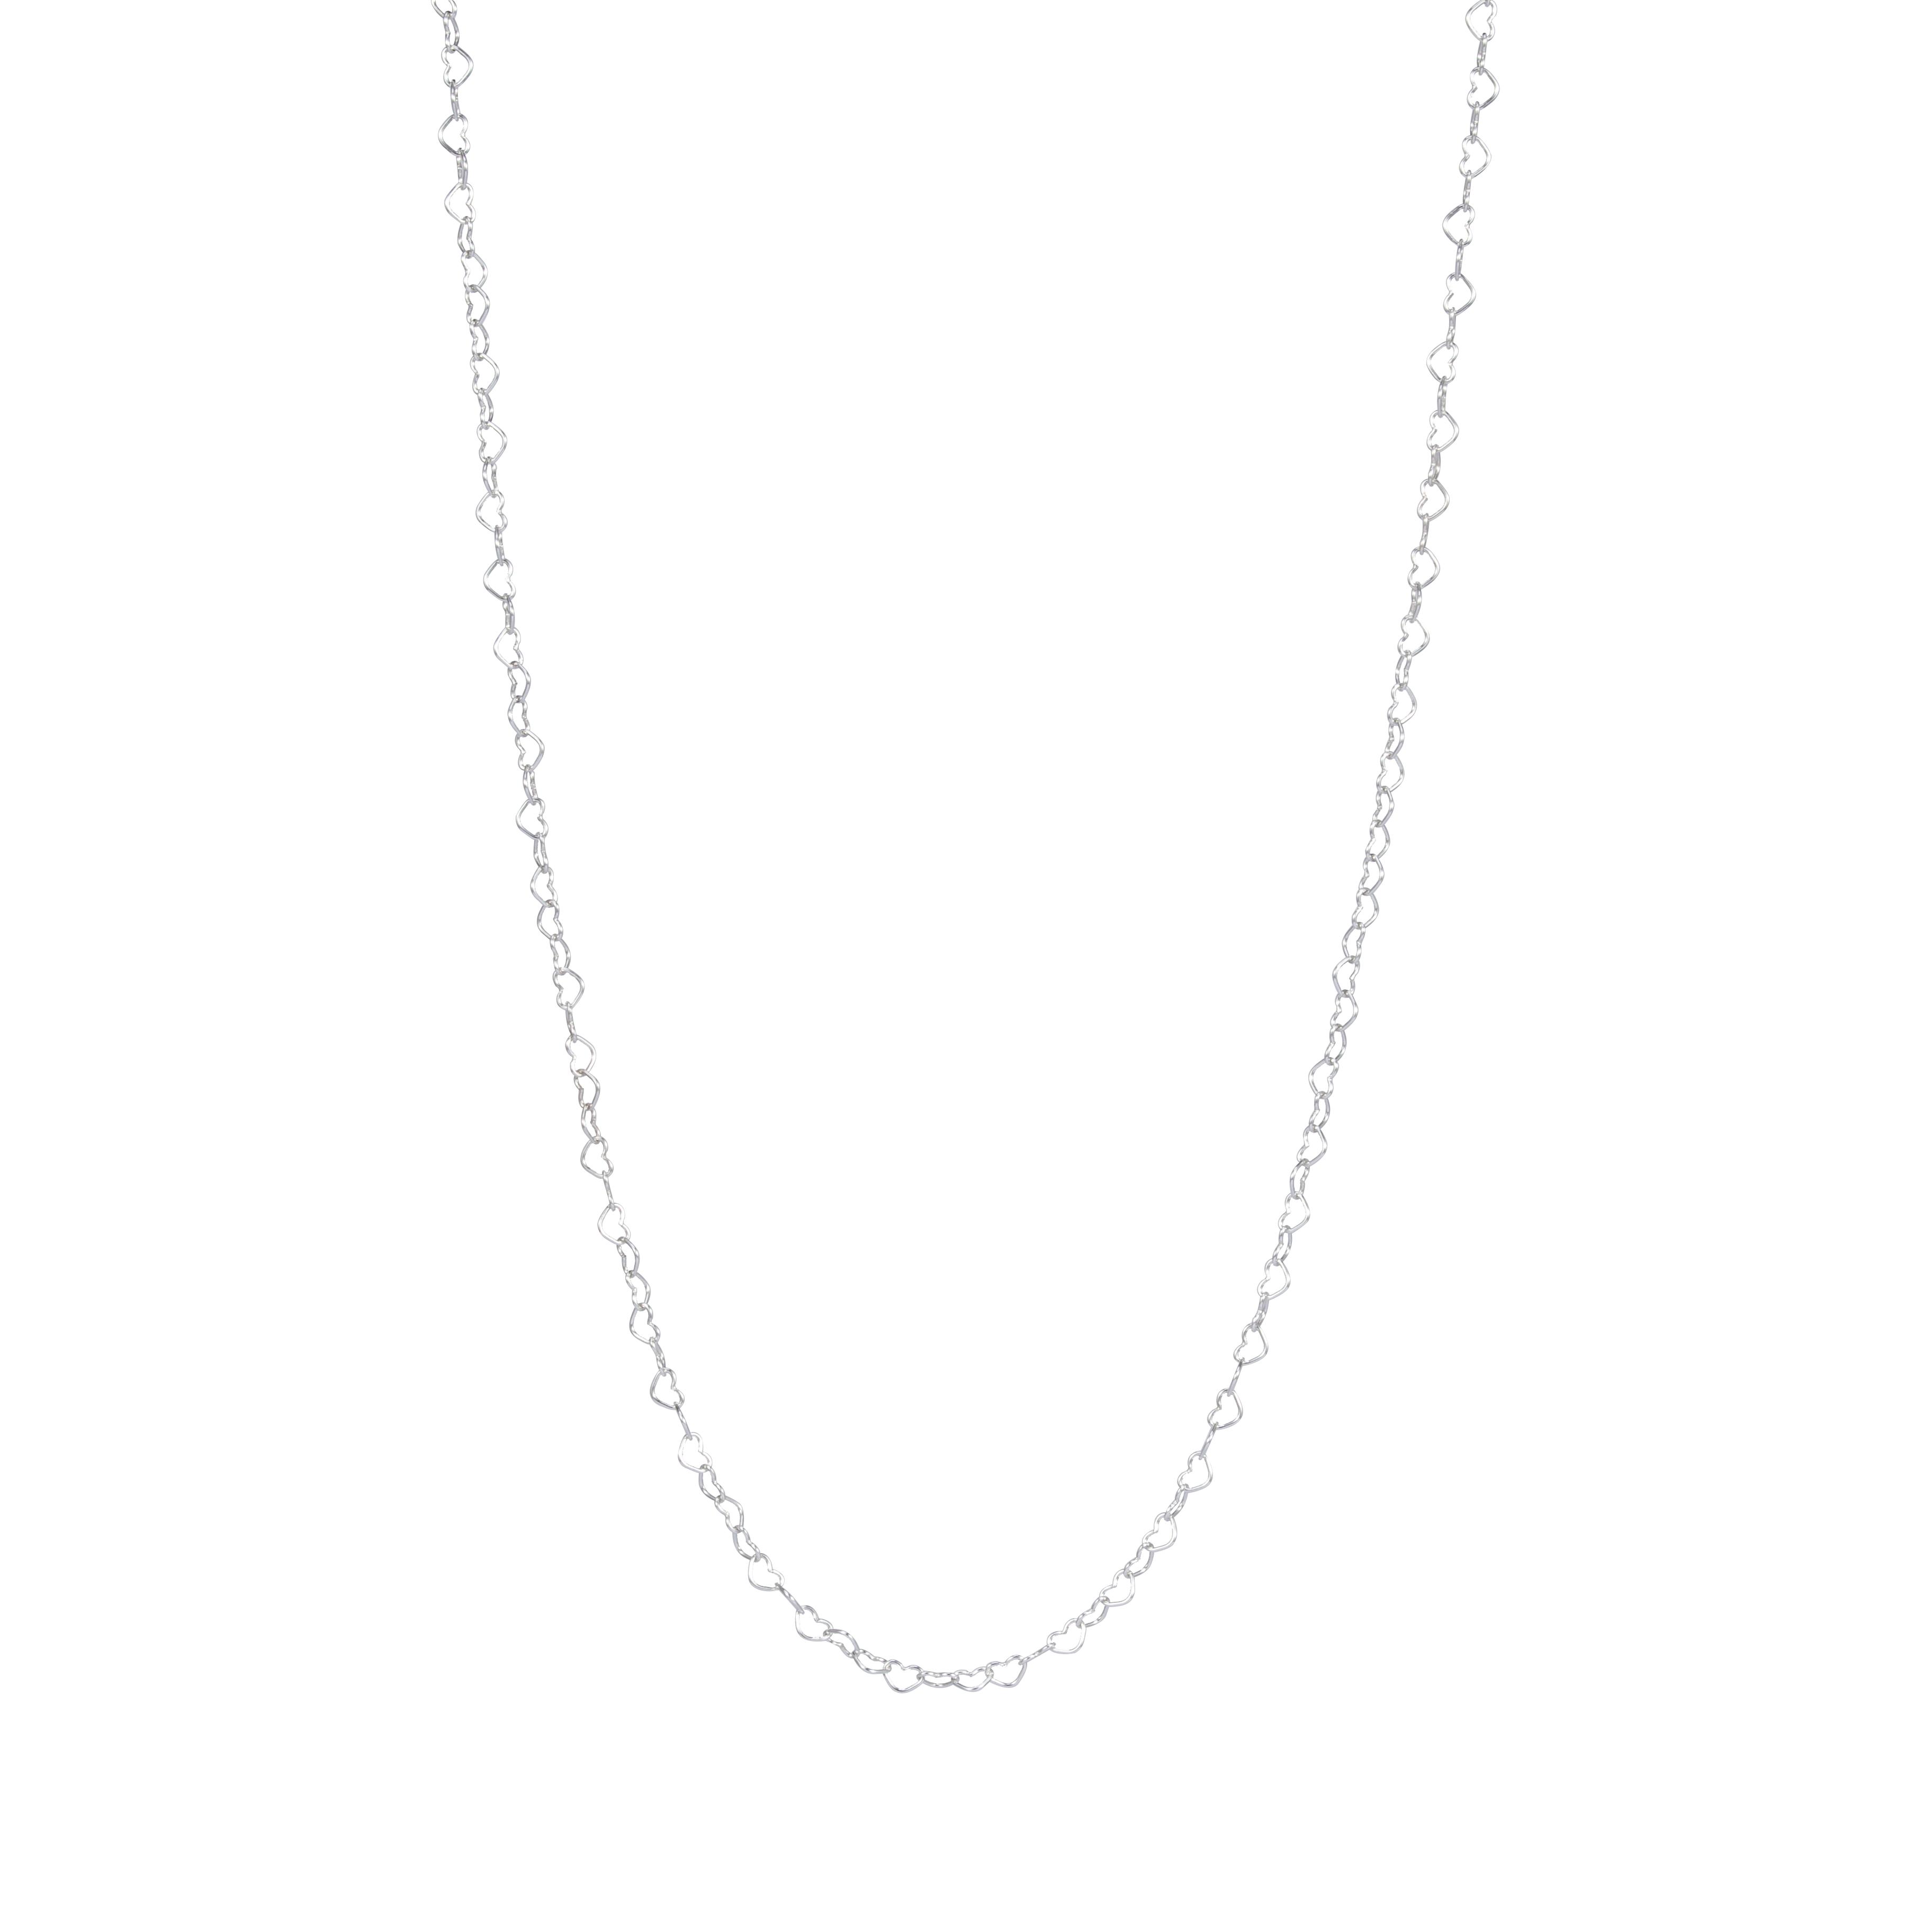 PANDORA 潘多拉 银色心心相连项链 397961-60